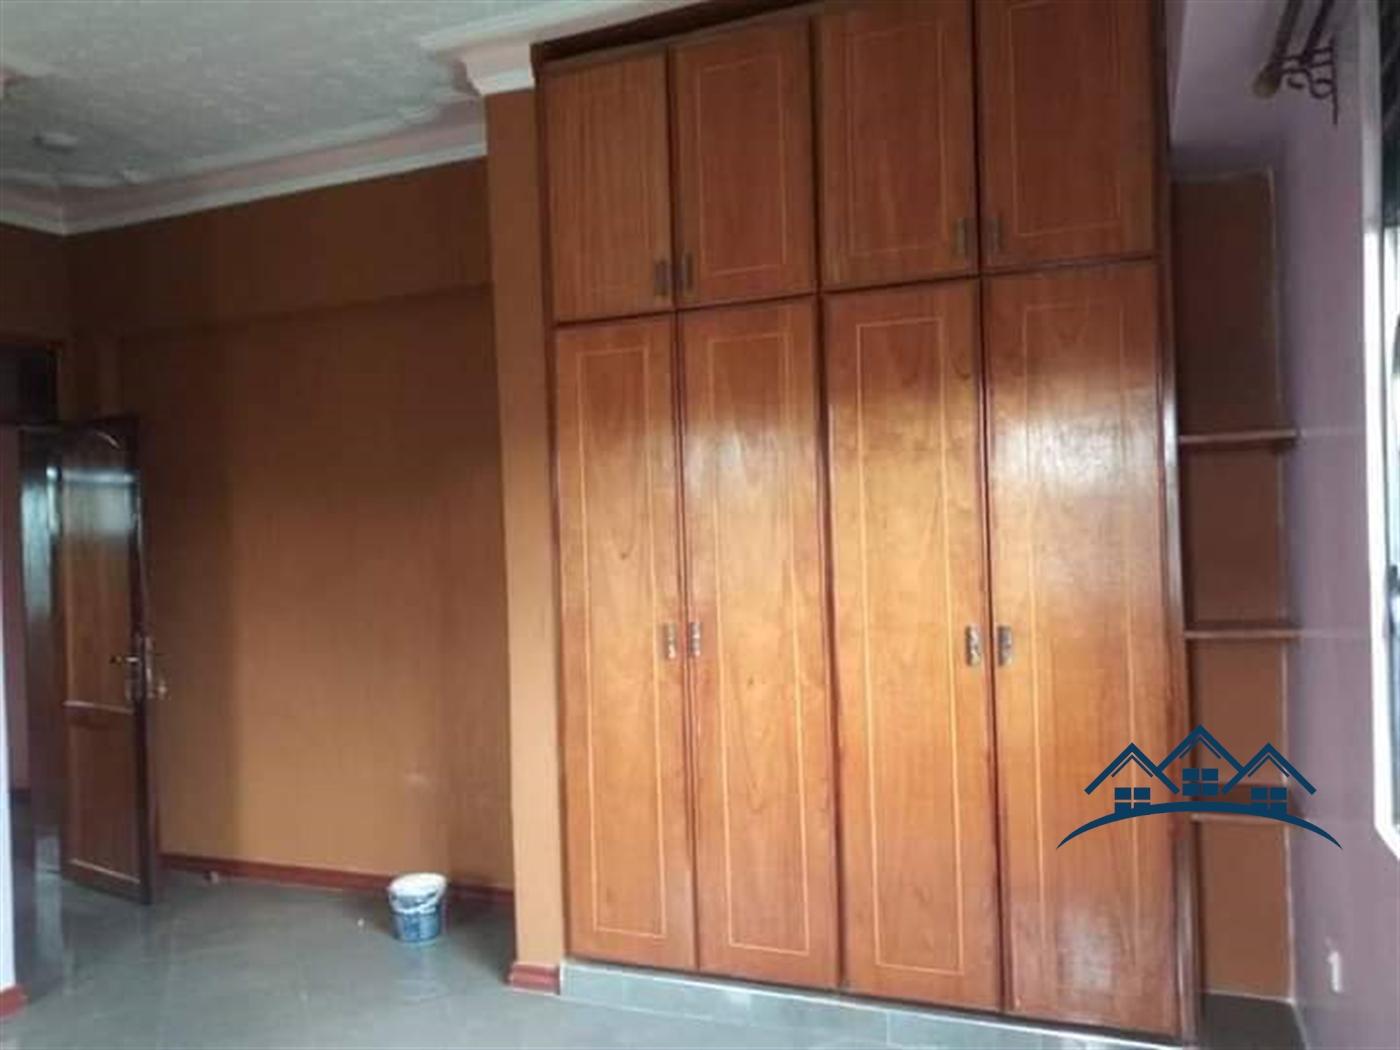 Rental units for rent in Namugongo Wakiso